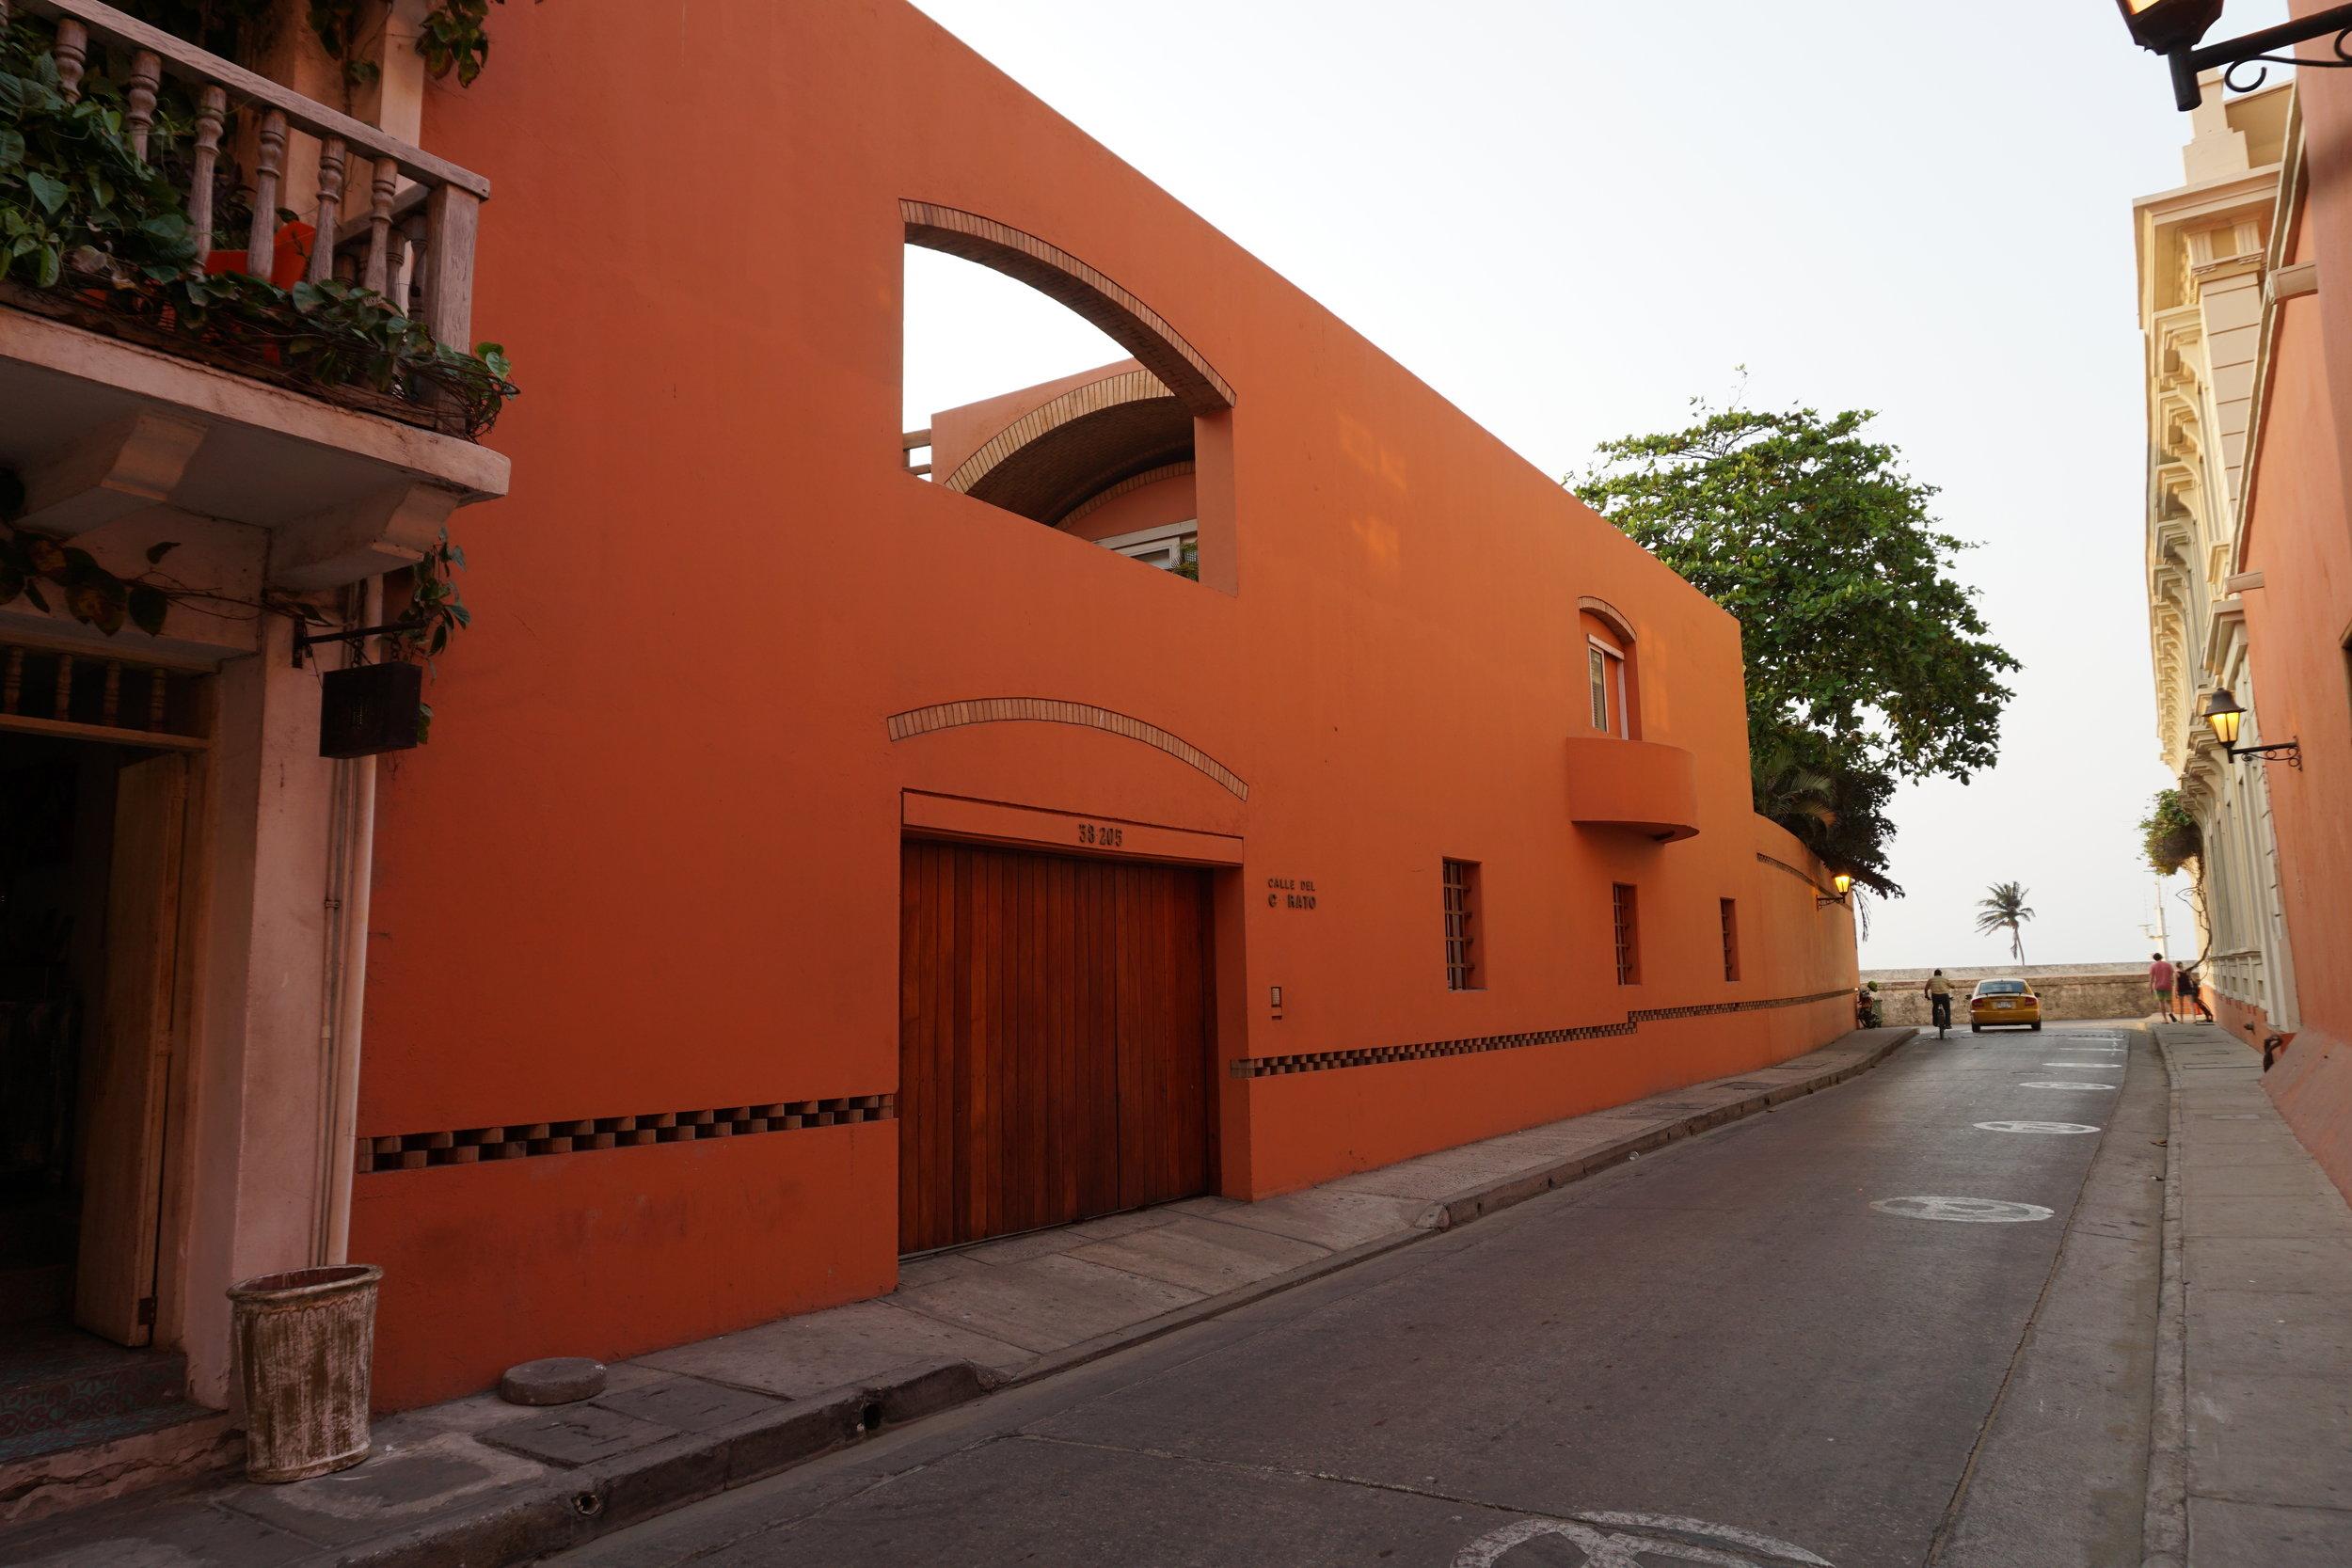 The home of Gabriel García Márquez